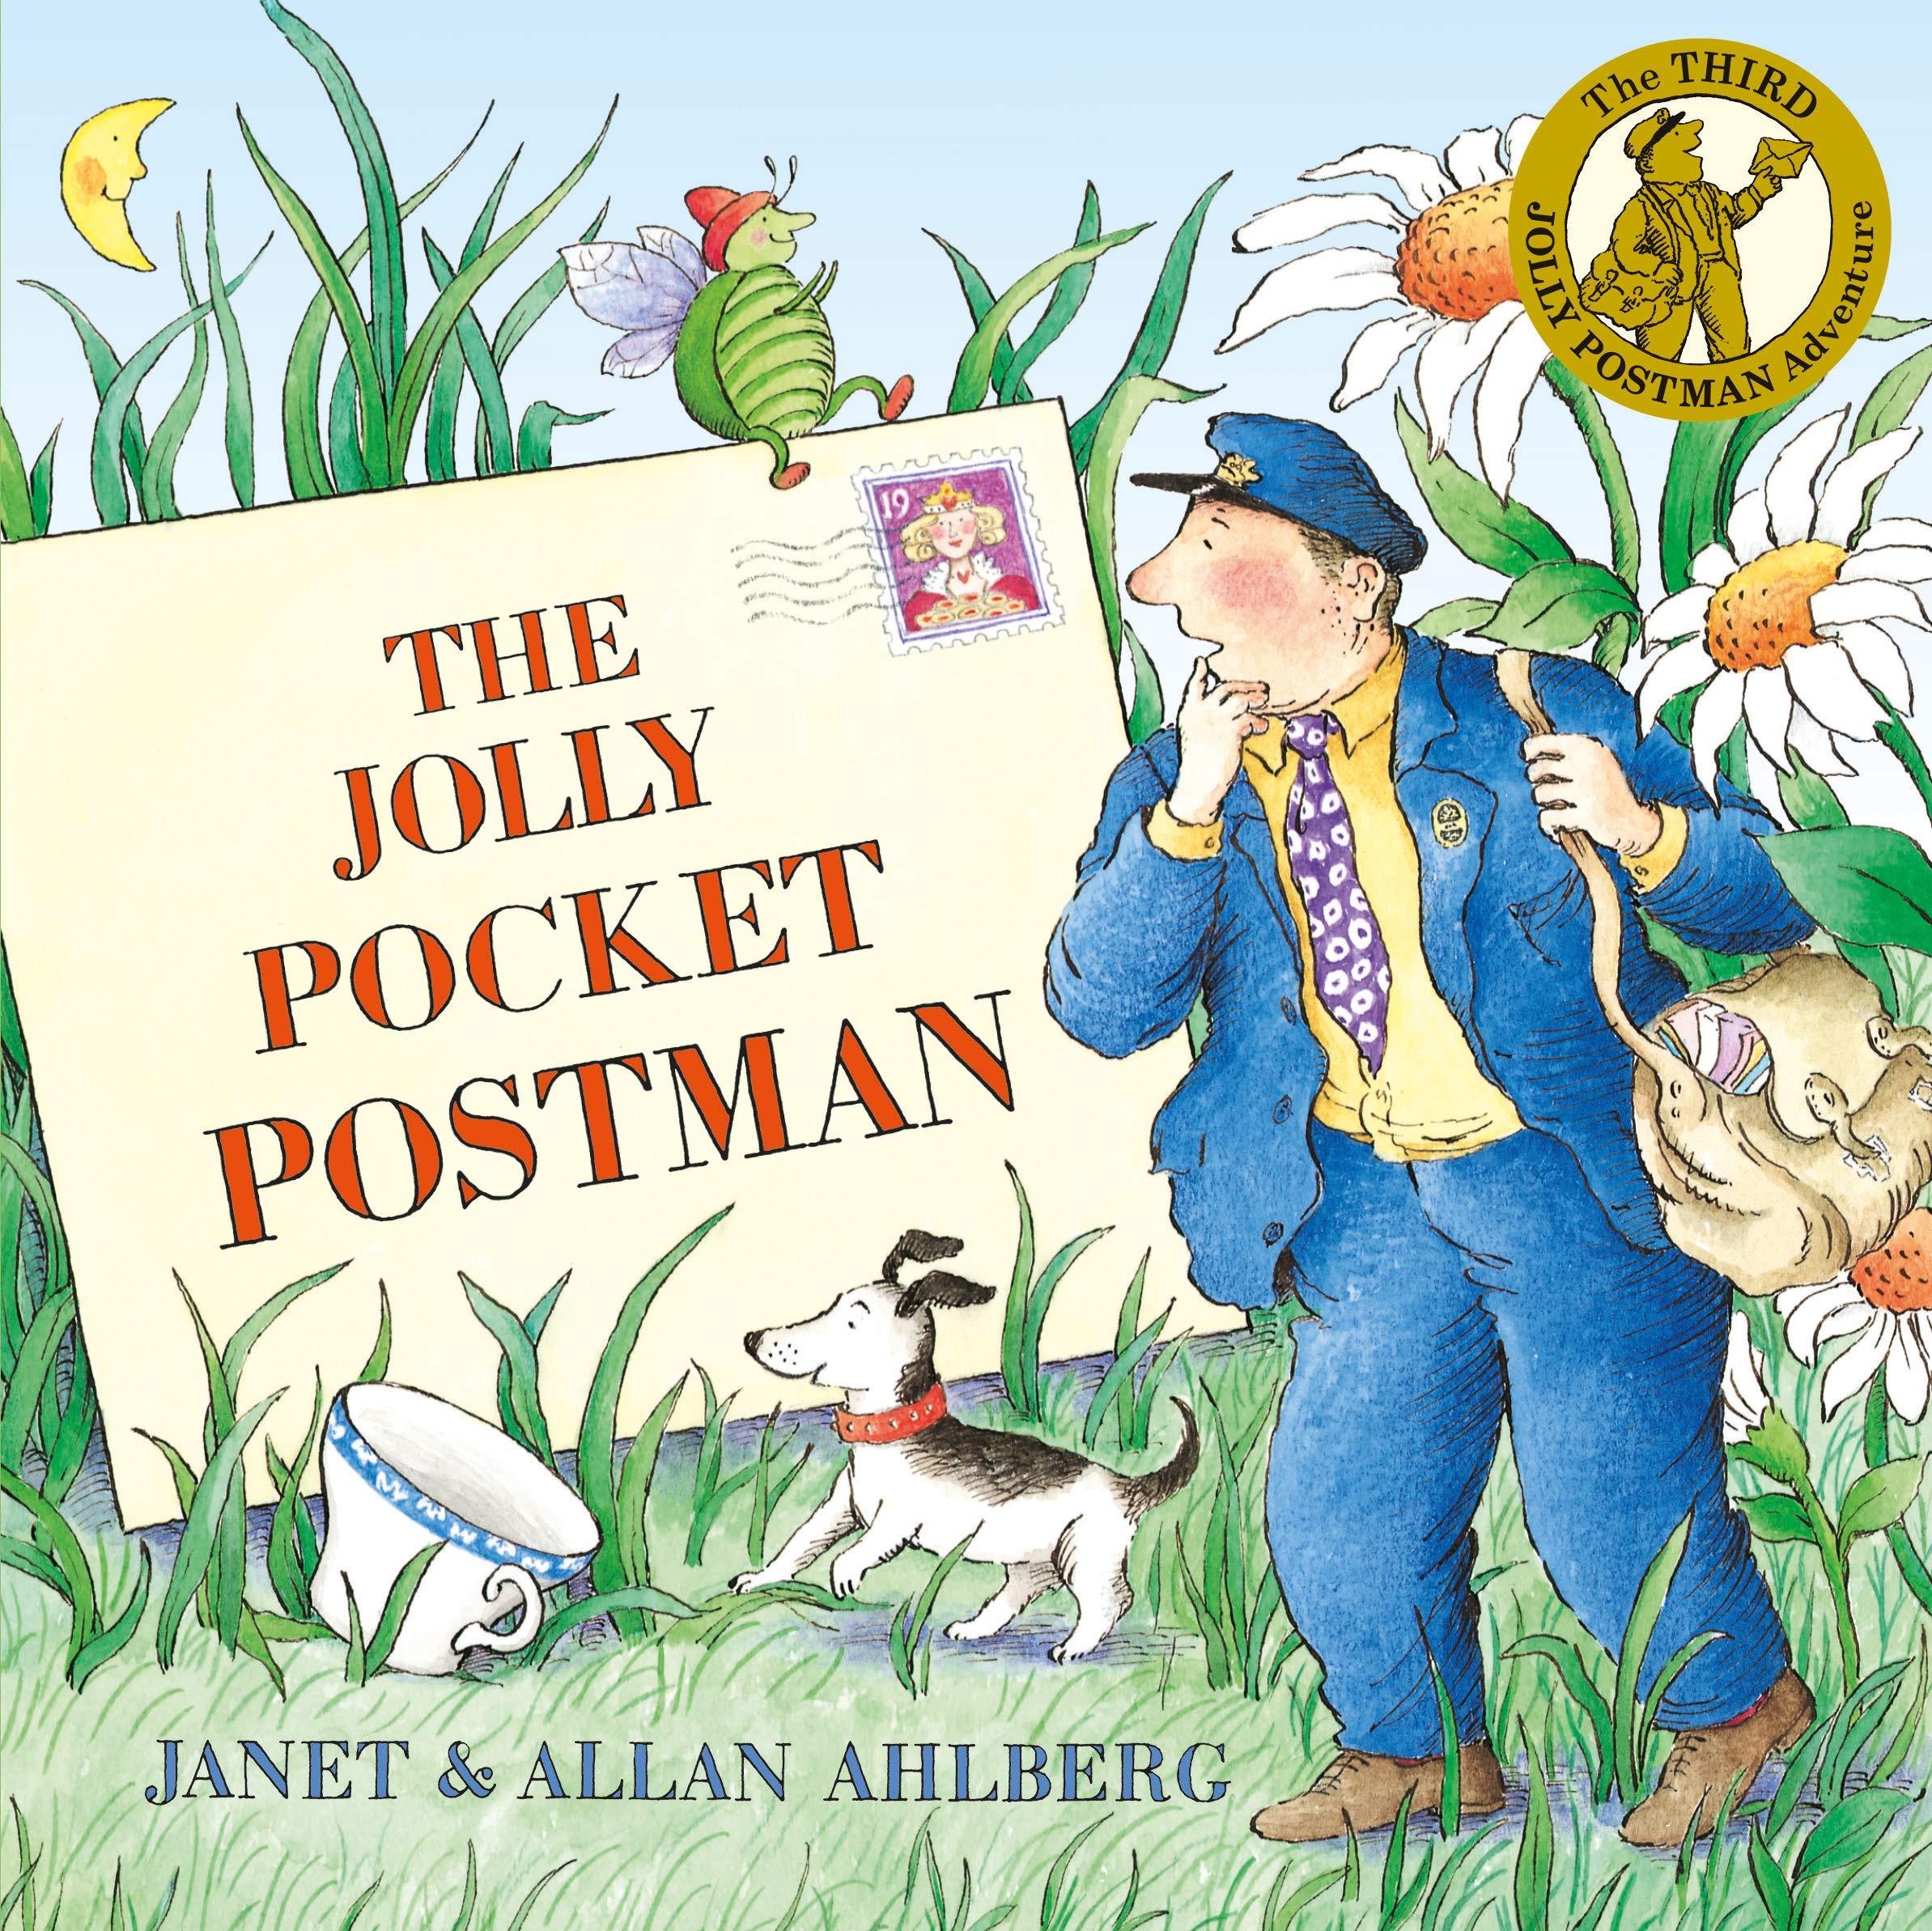 The Jolly Pocket Postman  Viking Kestrel Picture Books